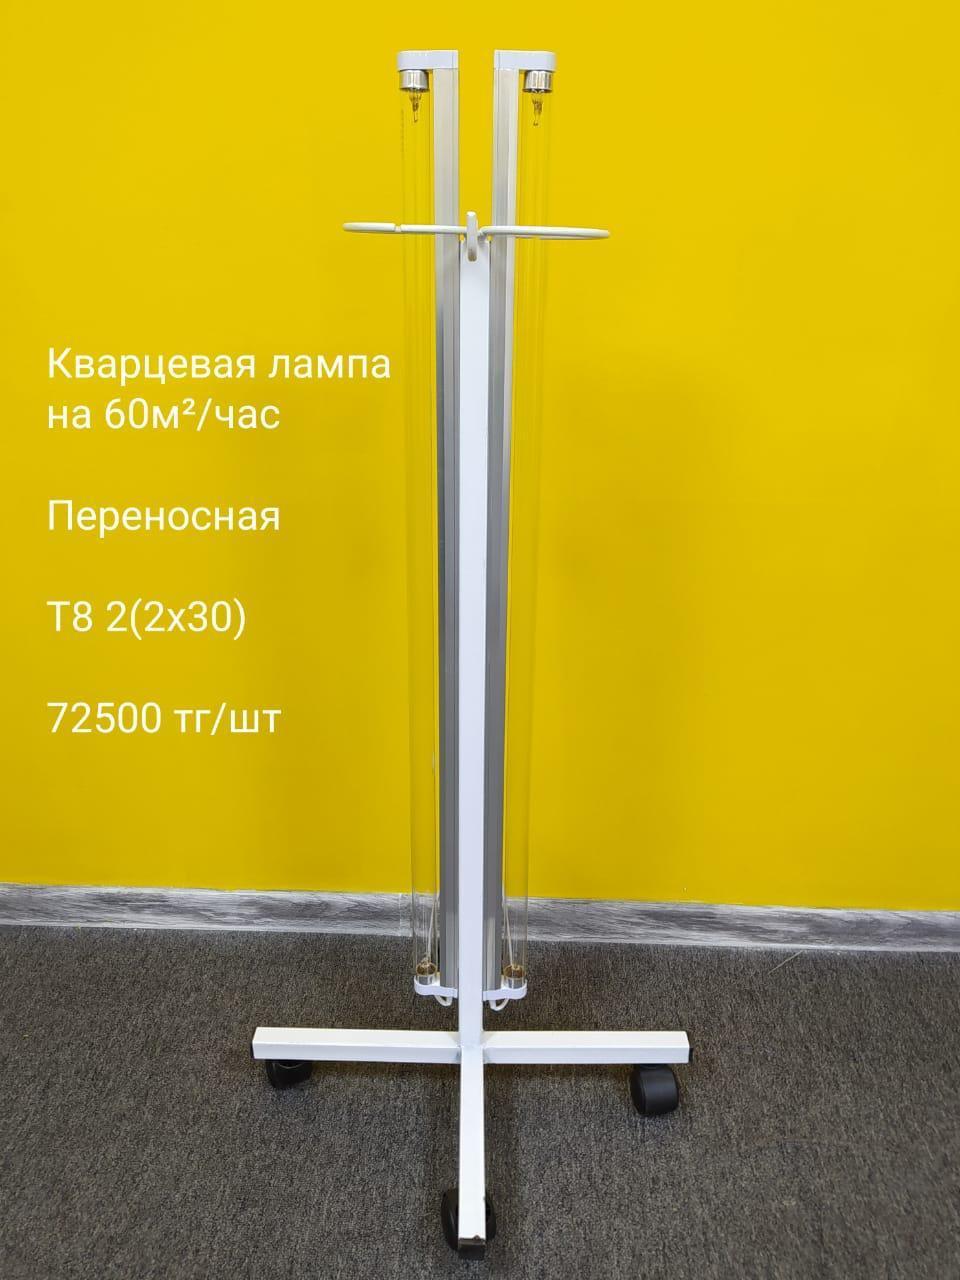 Кварцевая лампа, переносная бактерицидная лампа, ультрафиолетовая лампа для обеззараживания воздуха